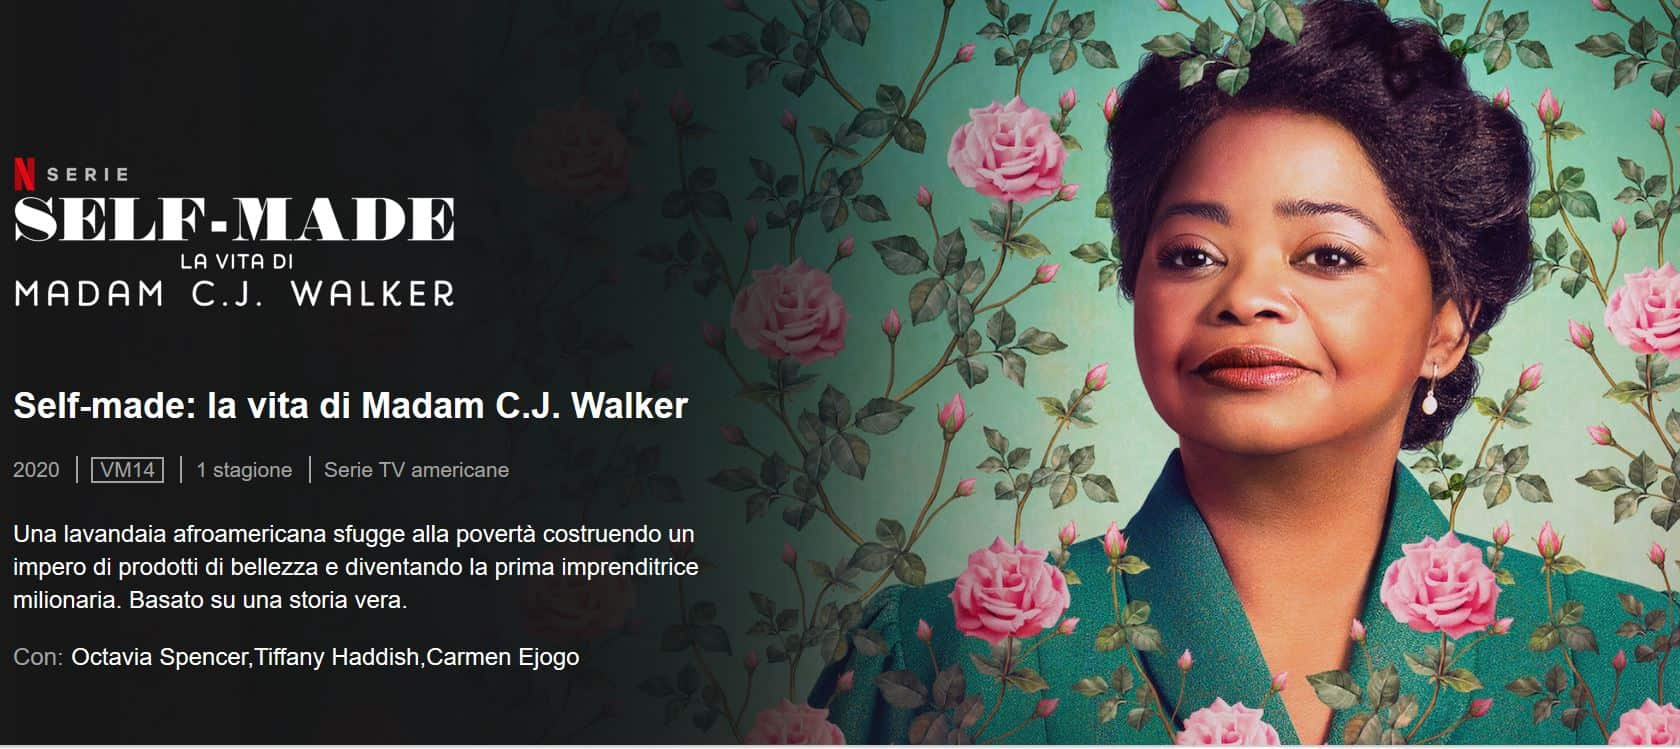 Su Netflix Self Made-La vita di Madam C.J. Walker una mini serie da vedere